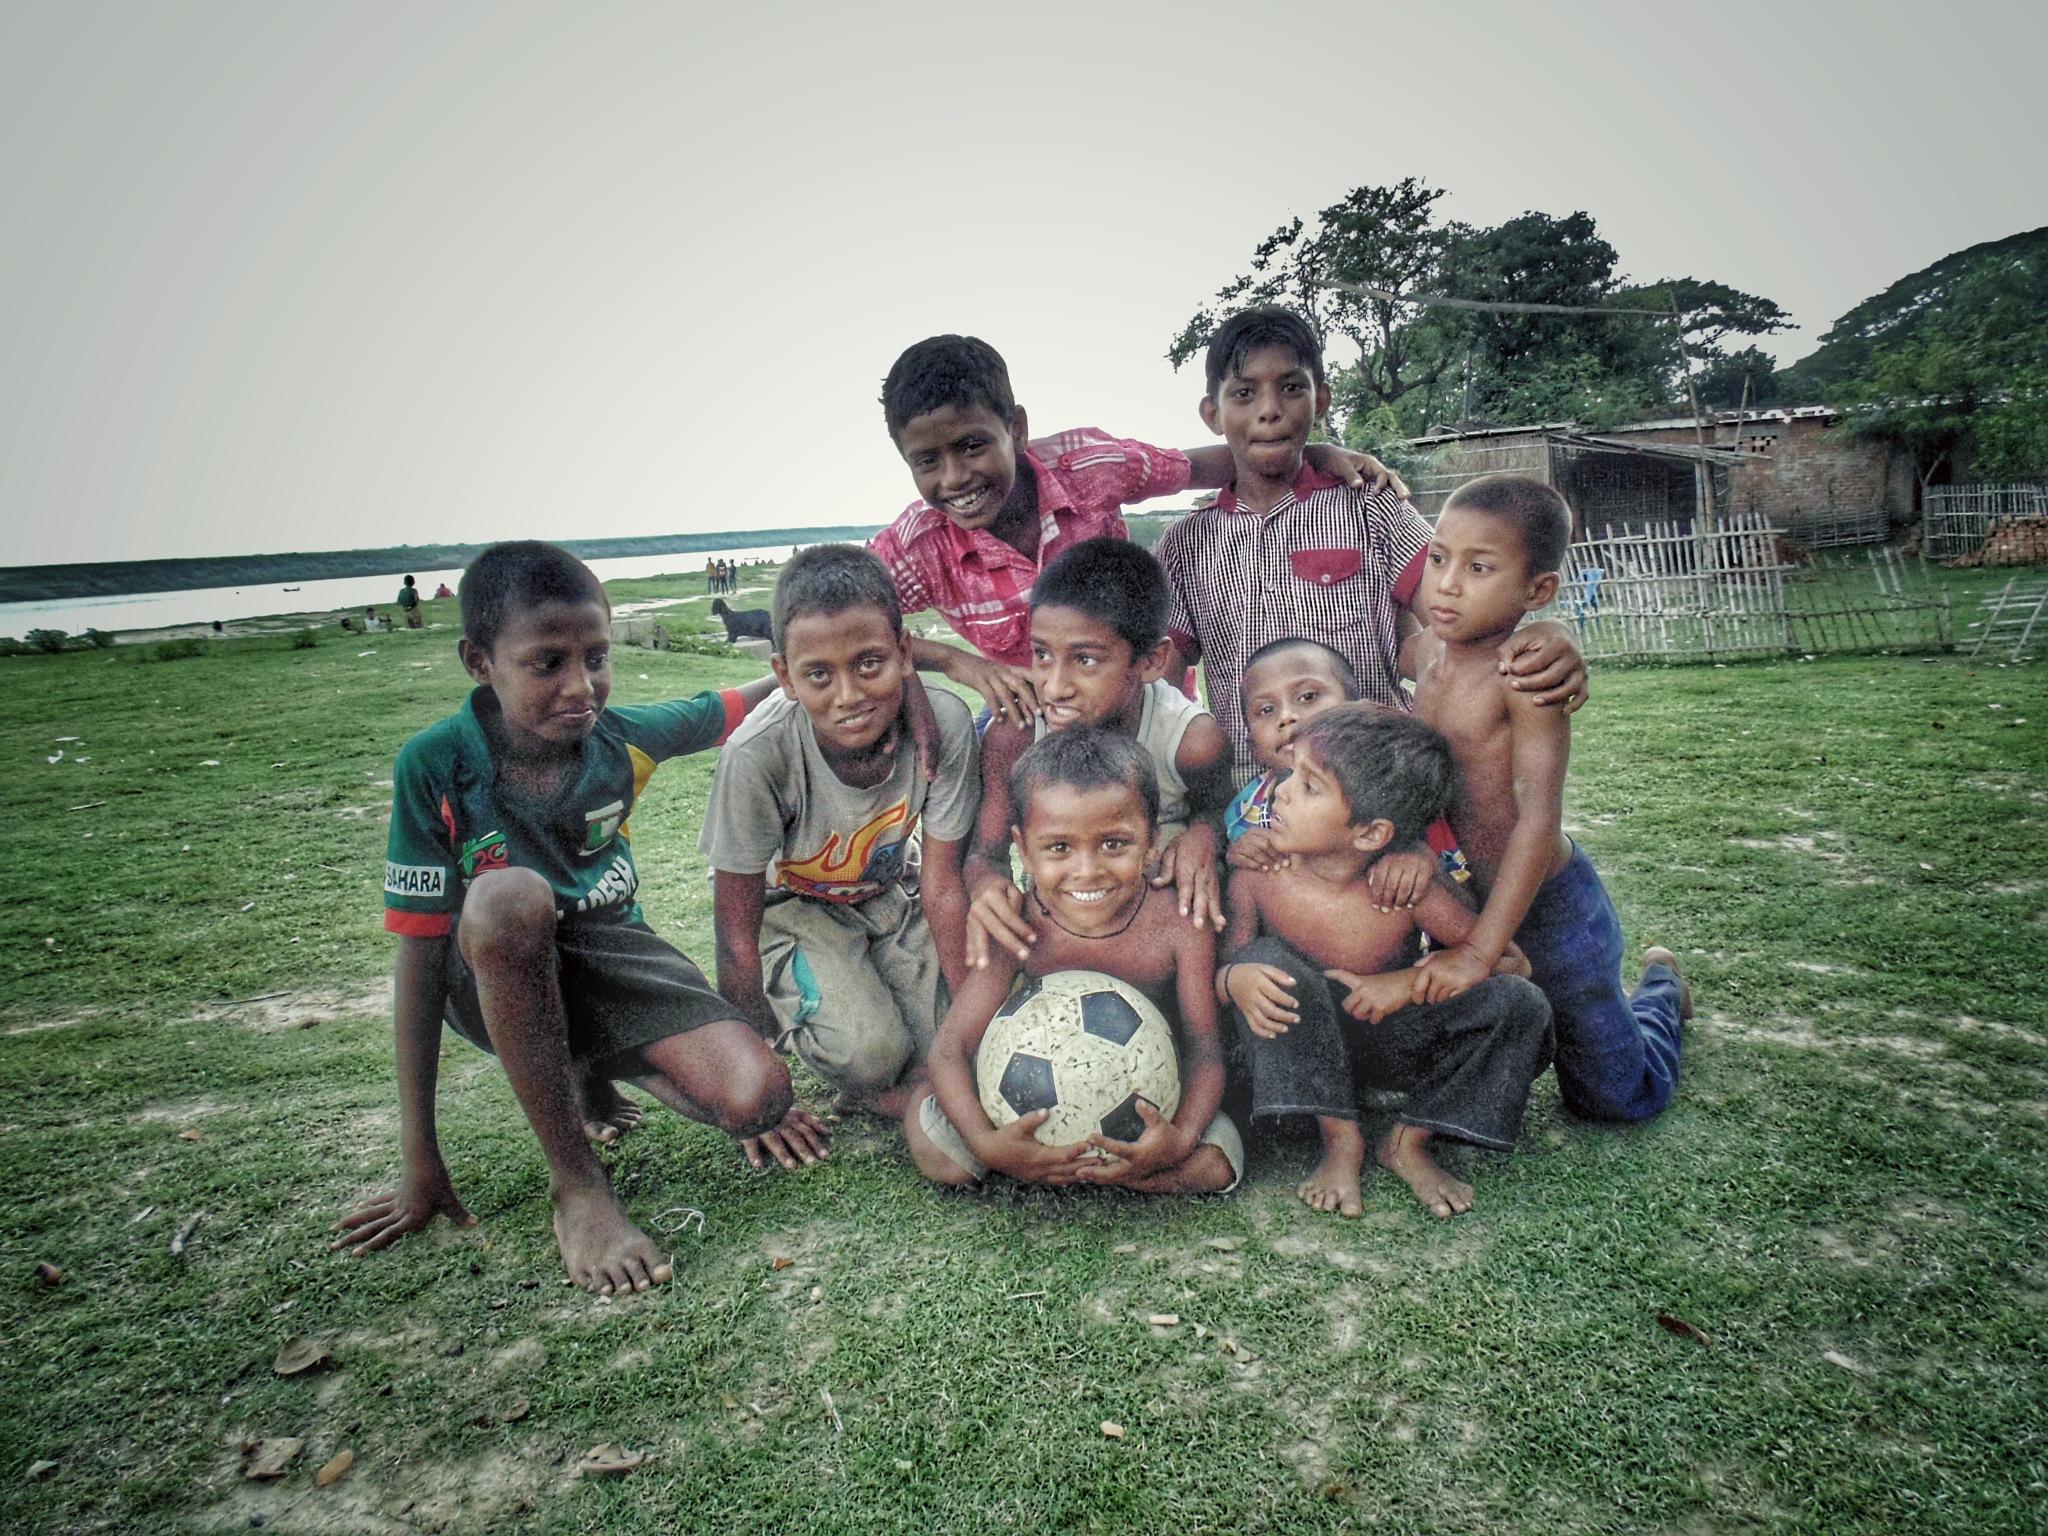 Football Team by Ashik Iqbal